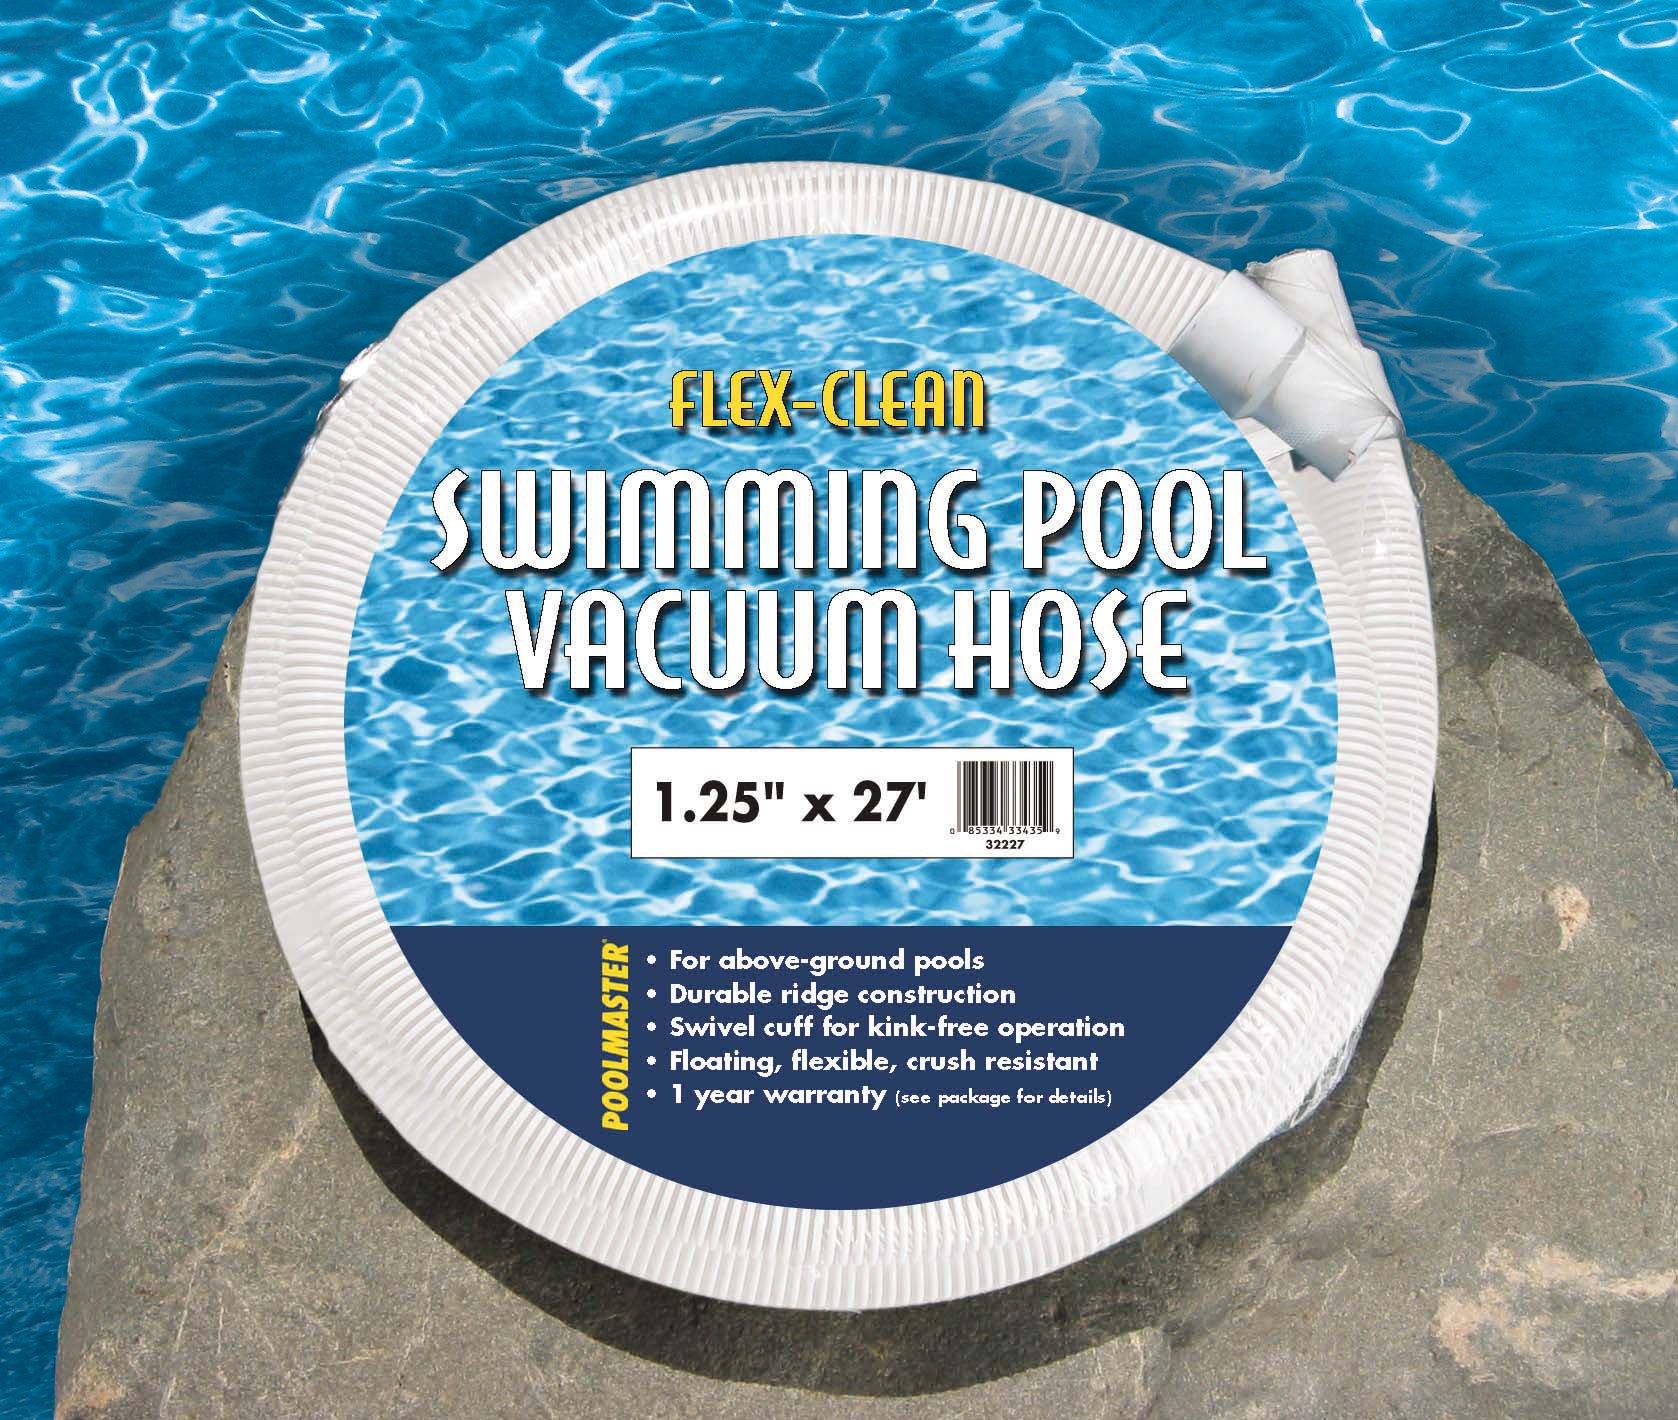 Poolmaster 32227 Above-Ground Swimming Pool Vacuum Hose, 1-1/4-Inch x 27-Feet by Poolmaster